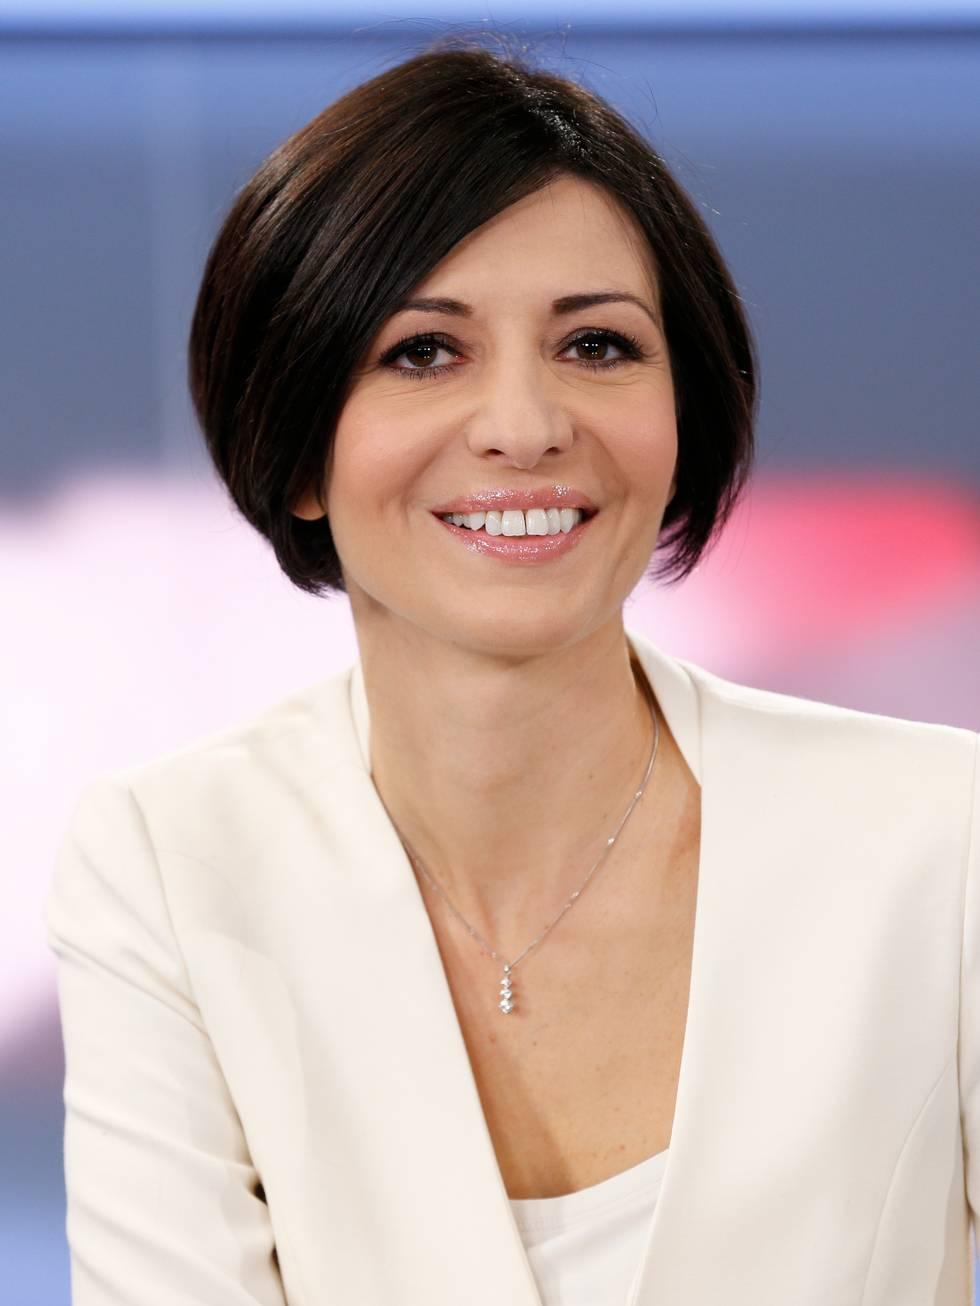 Francesca Mandelli